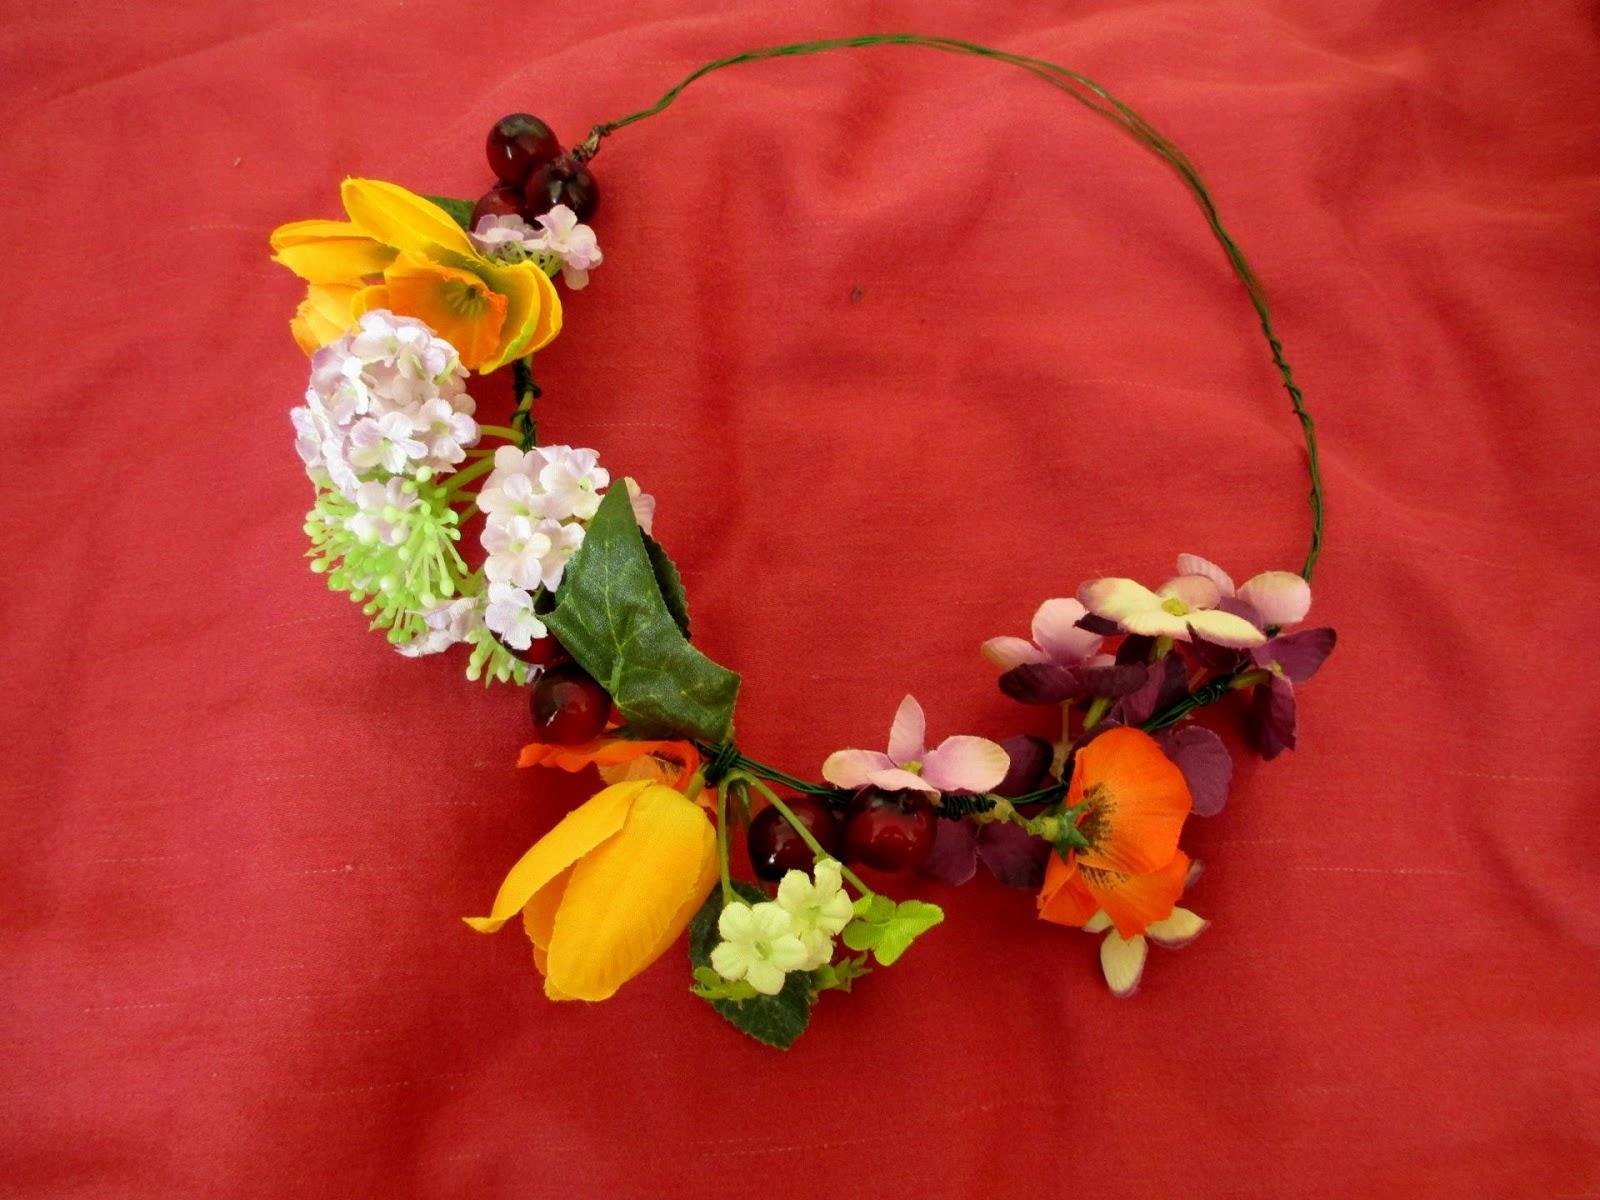 Flower crown overlay flower crown overlay photo28 izmirmasajfo